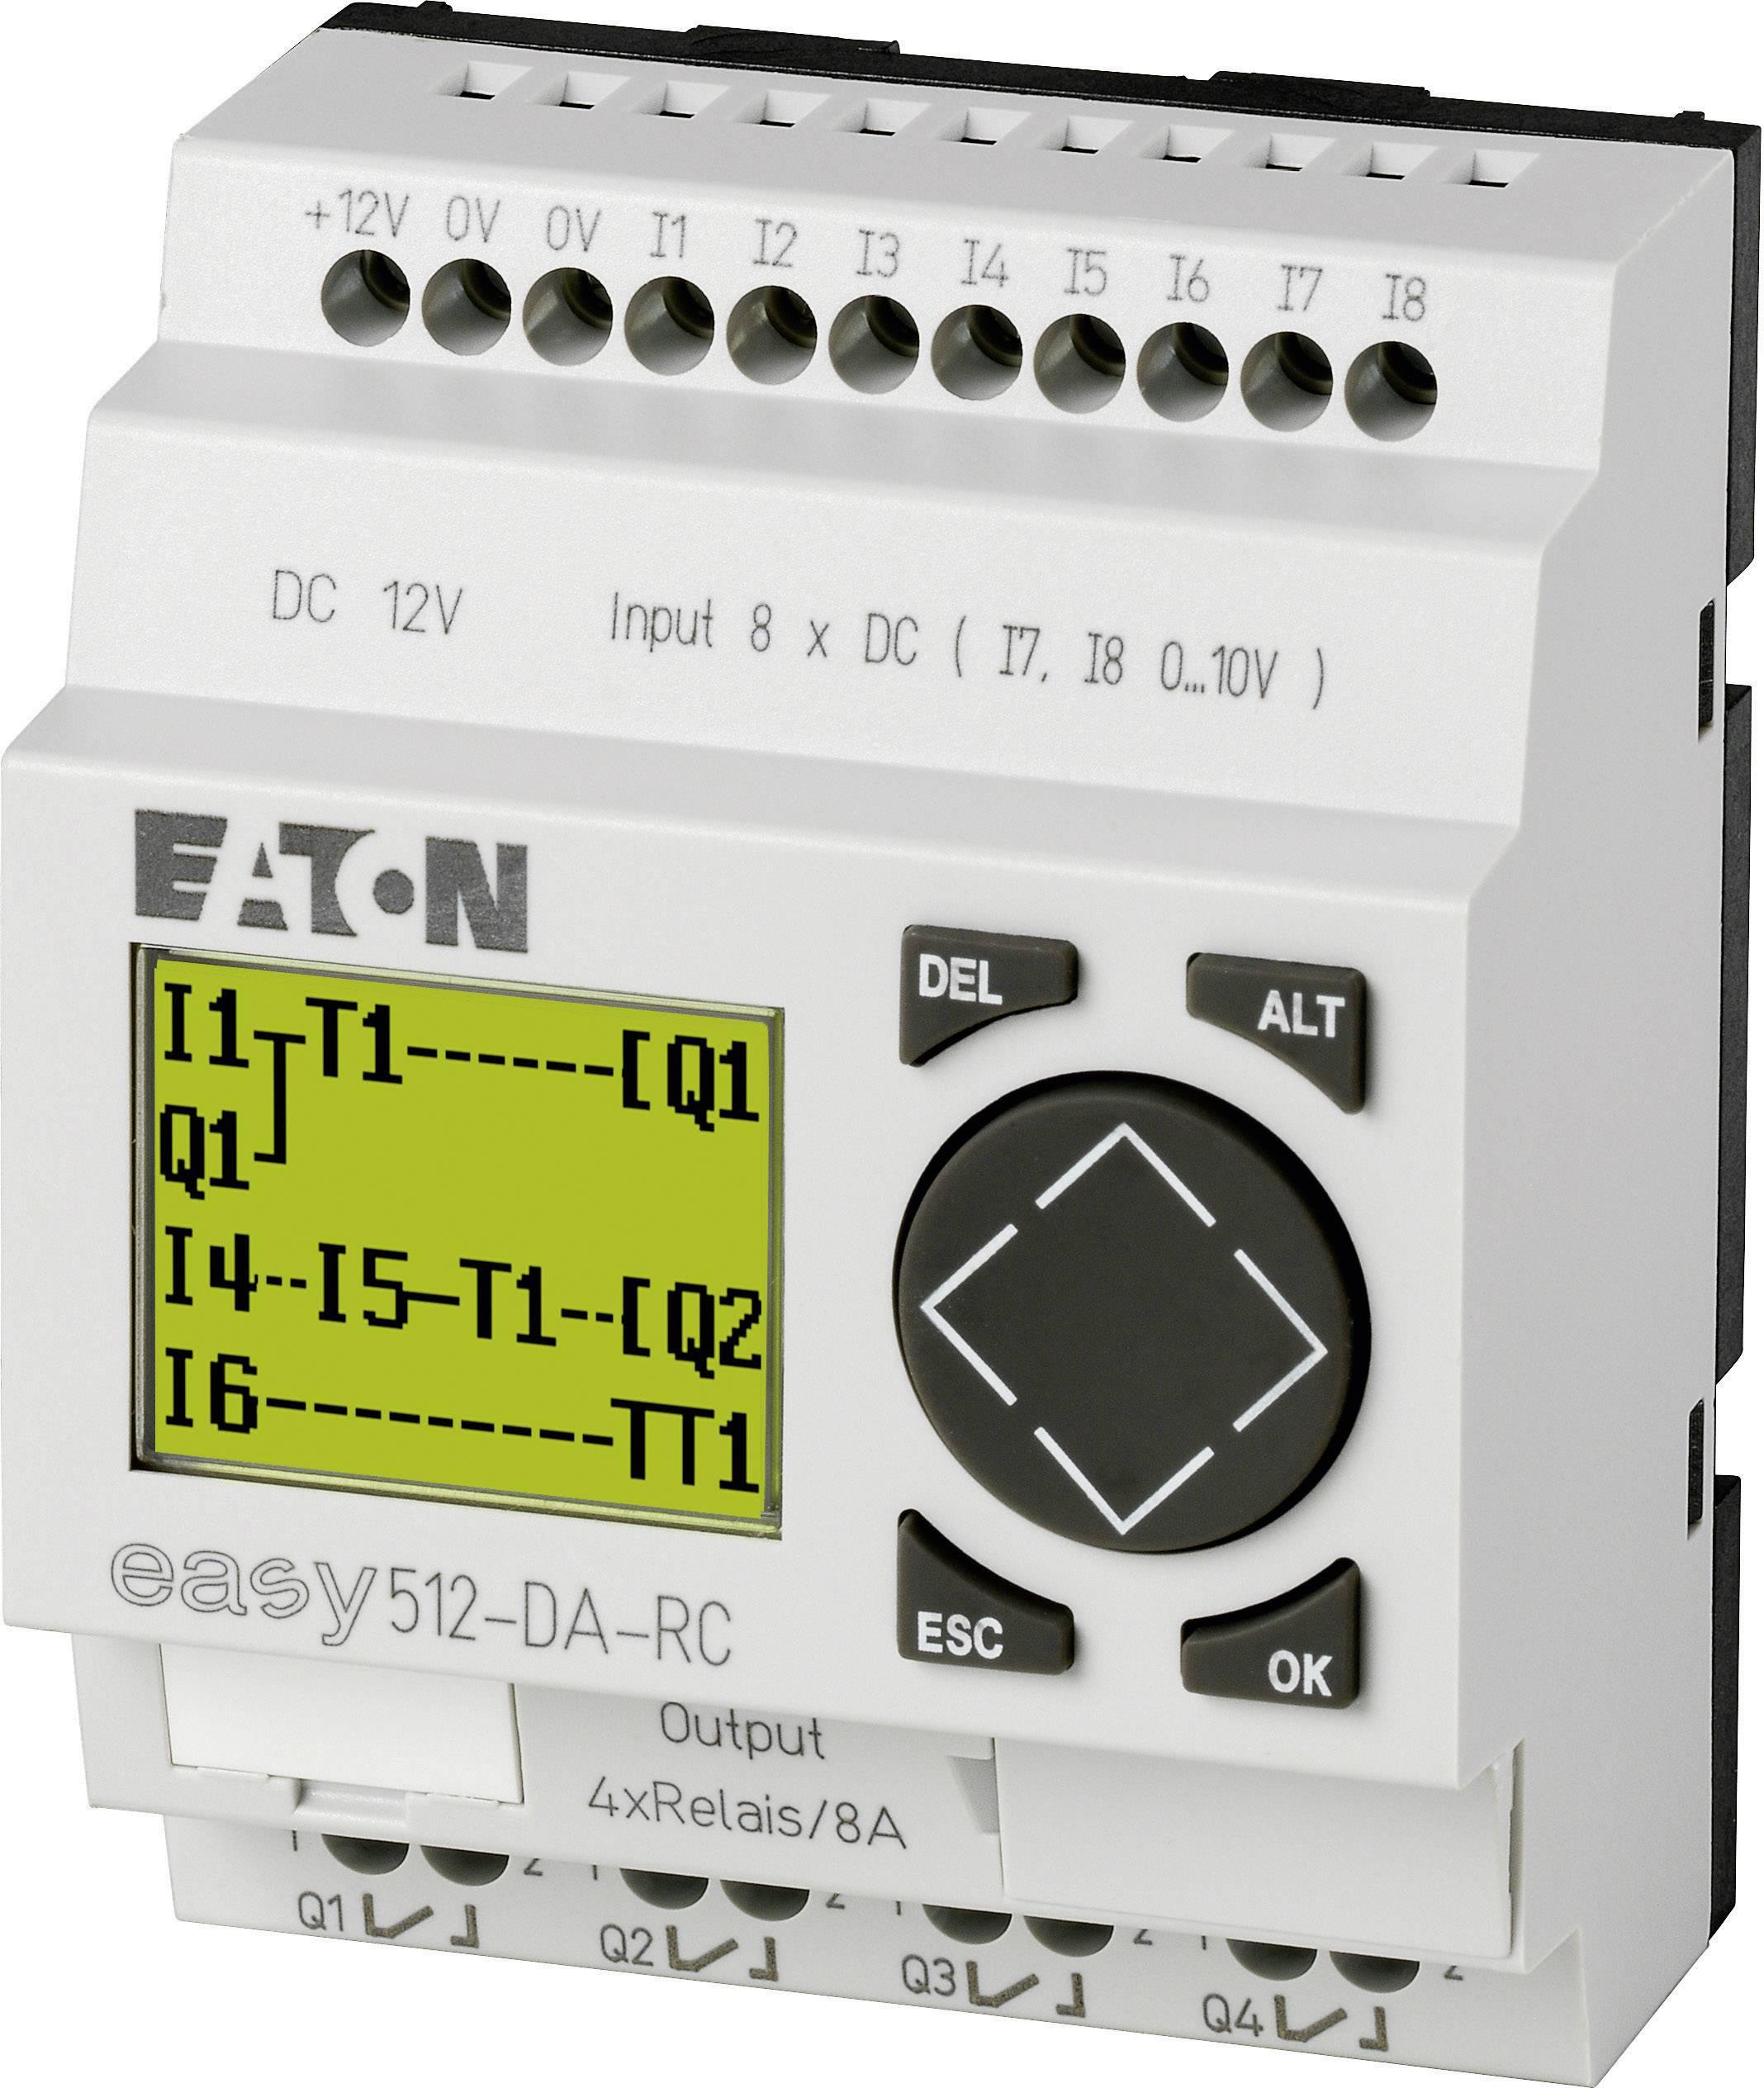 Riadiacimodul Eaton easy 512-DA-RC 274106, 12 V/DC